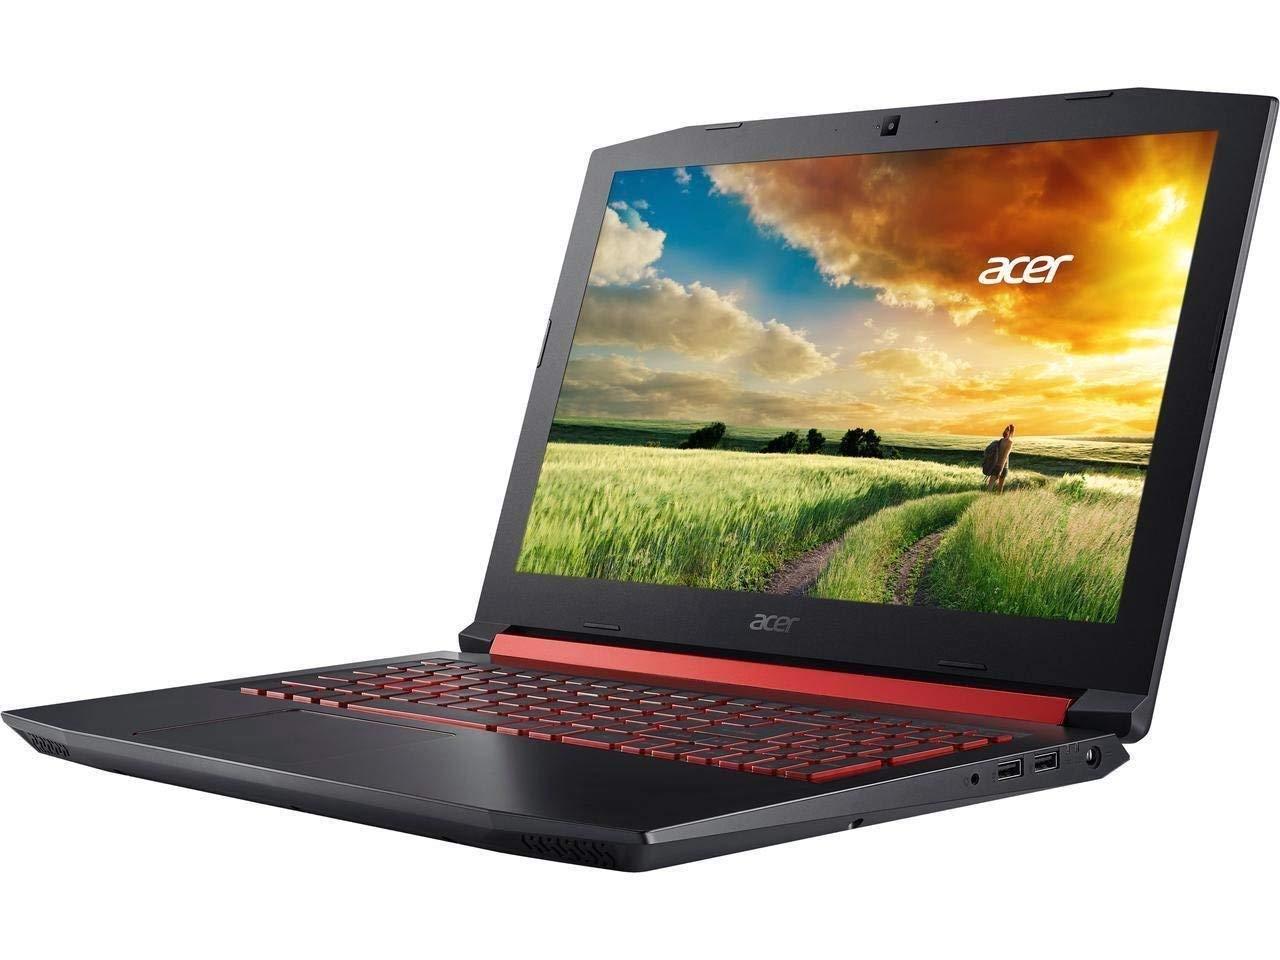 Acer Nitro 5 (2018) Best Gaming Laptop in India